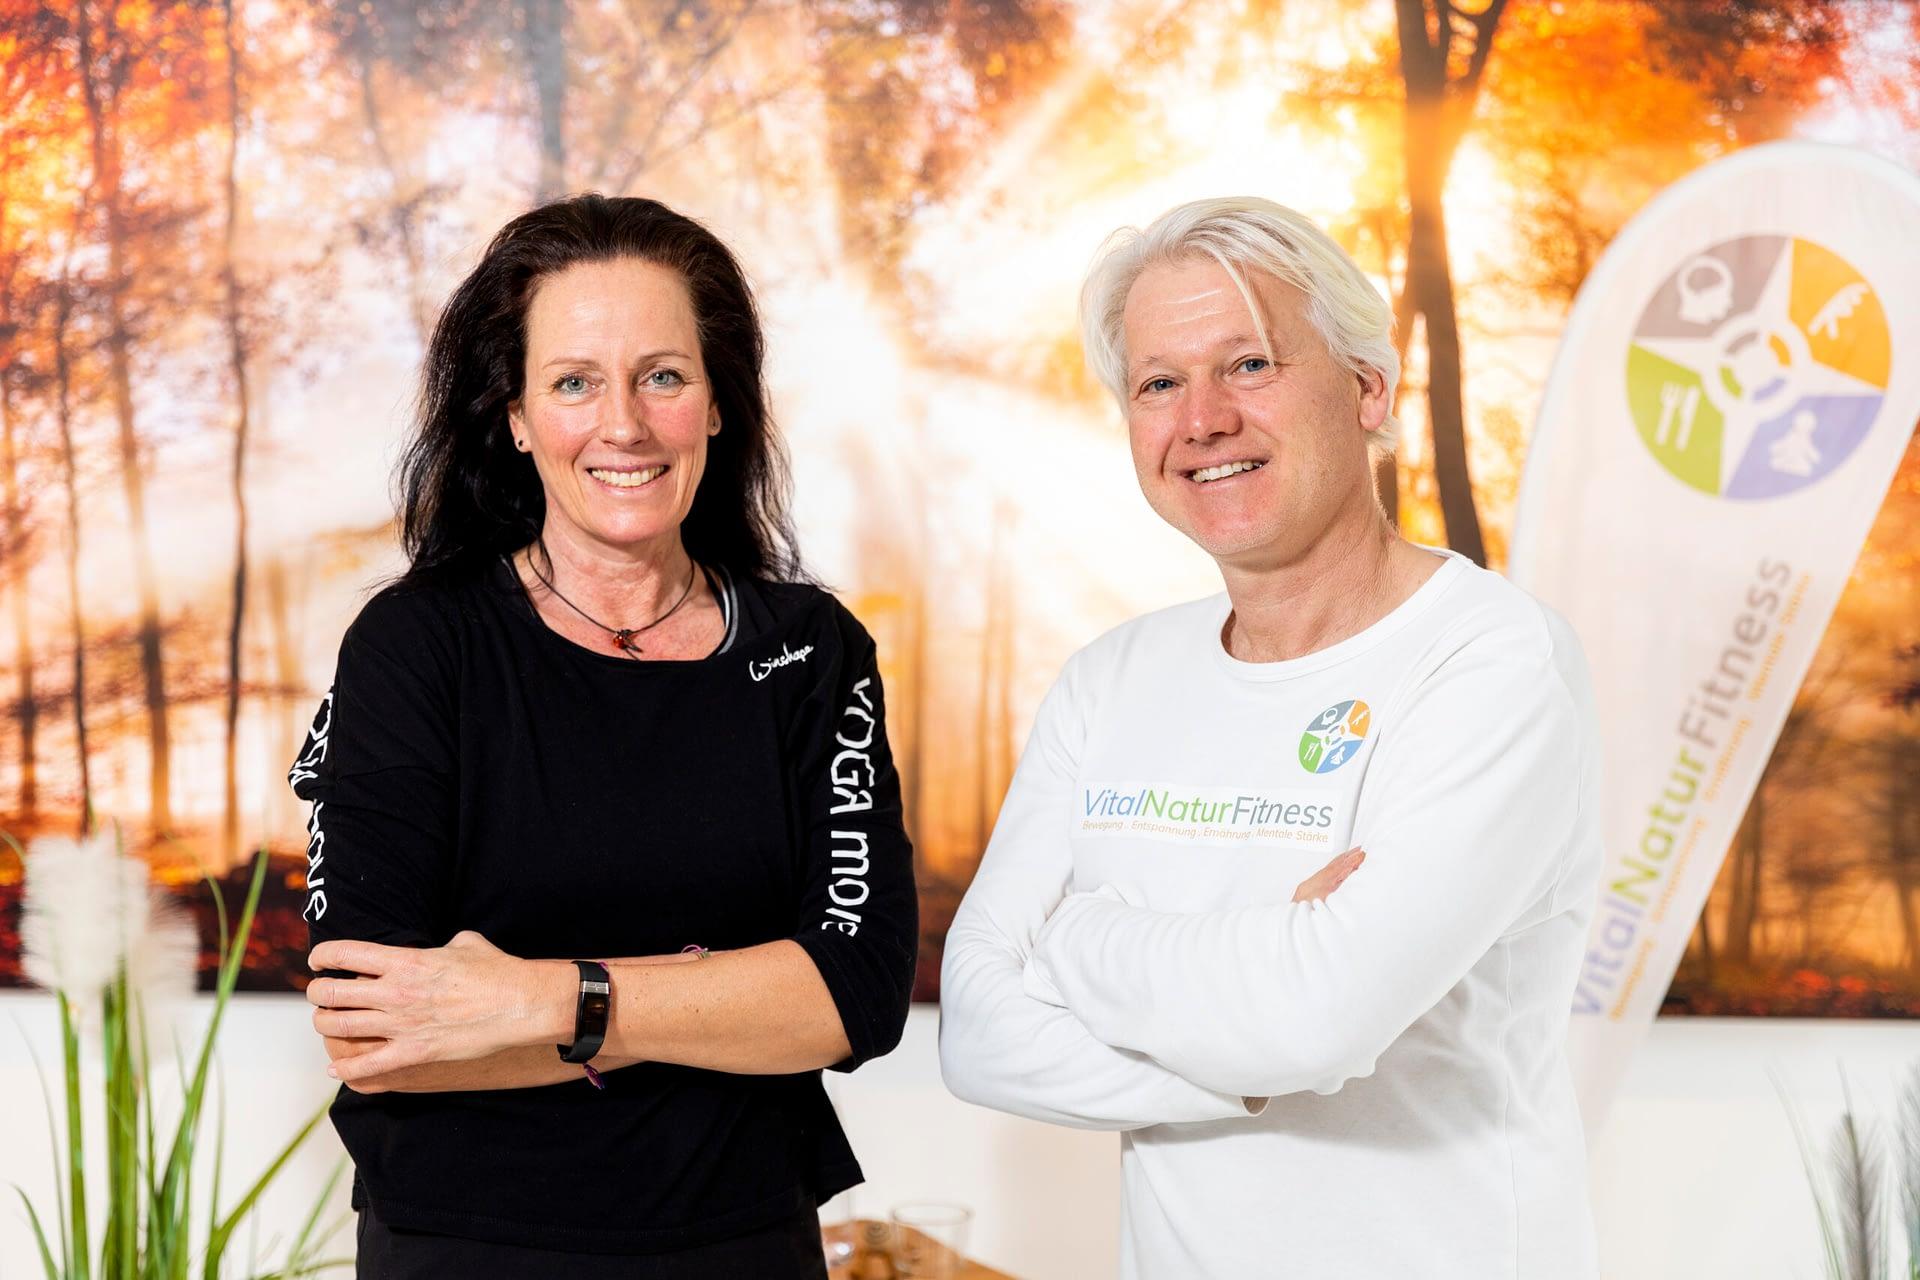 Sylvia Dittmar & Thomas Humer